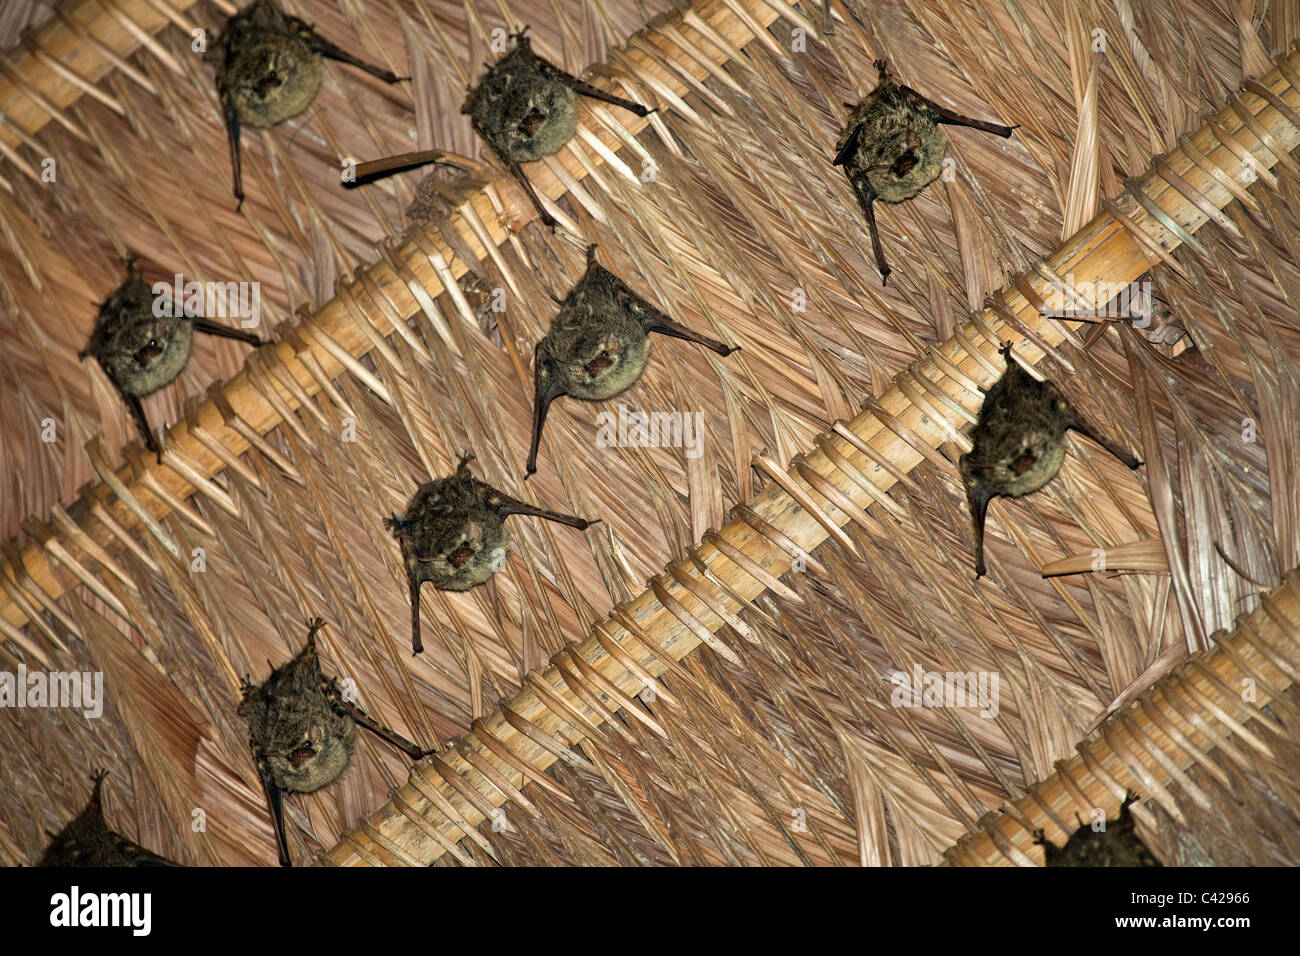 Peru, Boca Manu, Blanquillo, Manu Nationalpark, UNESCO-Weltkulturerbe. Fledermäuse. Stockbild